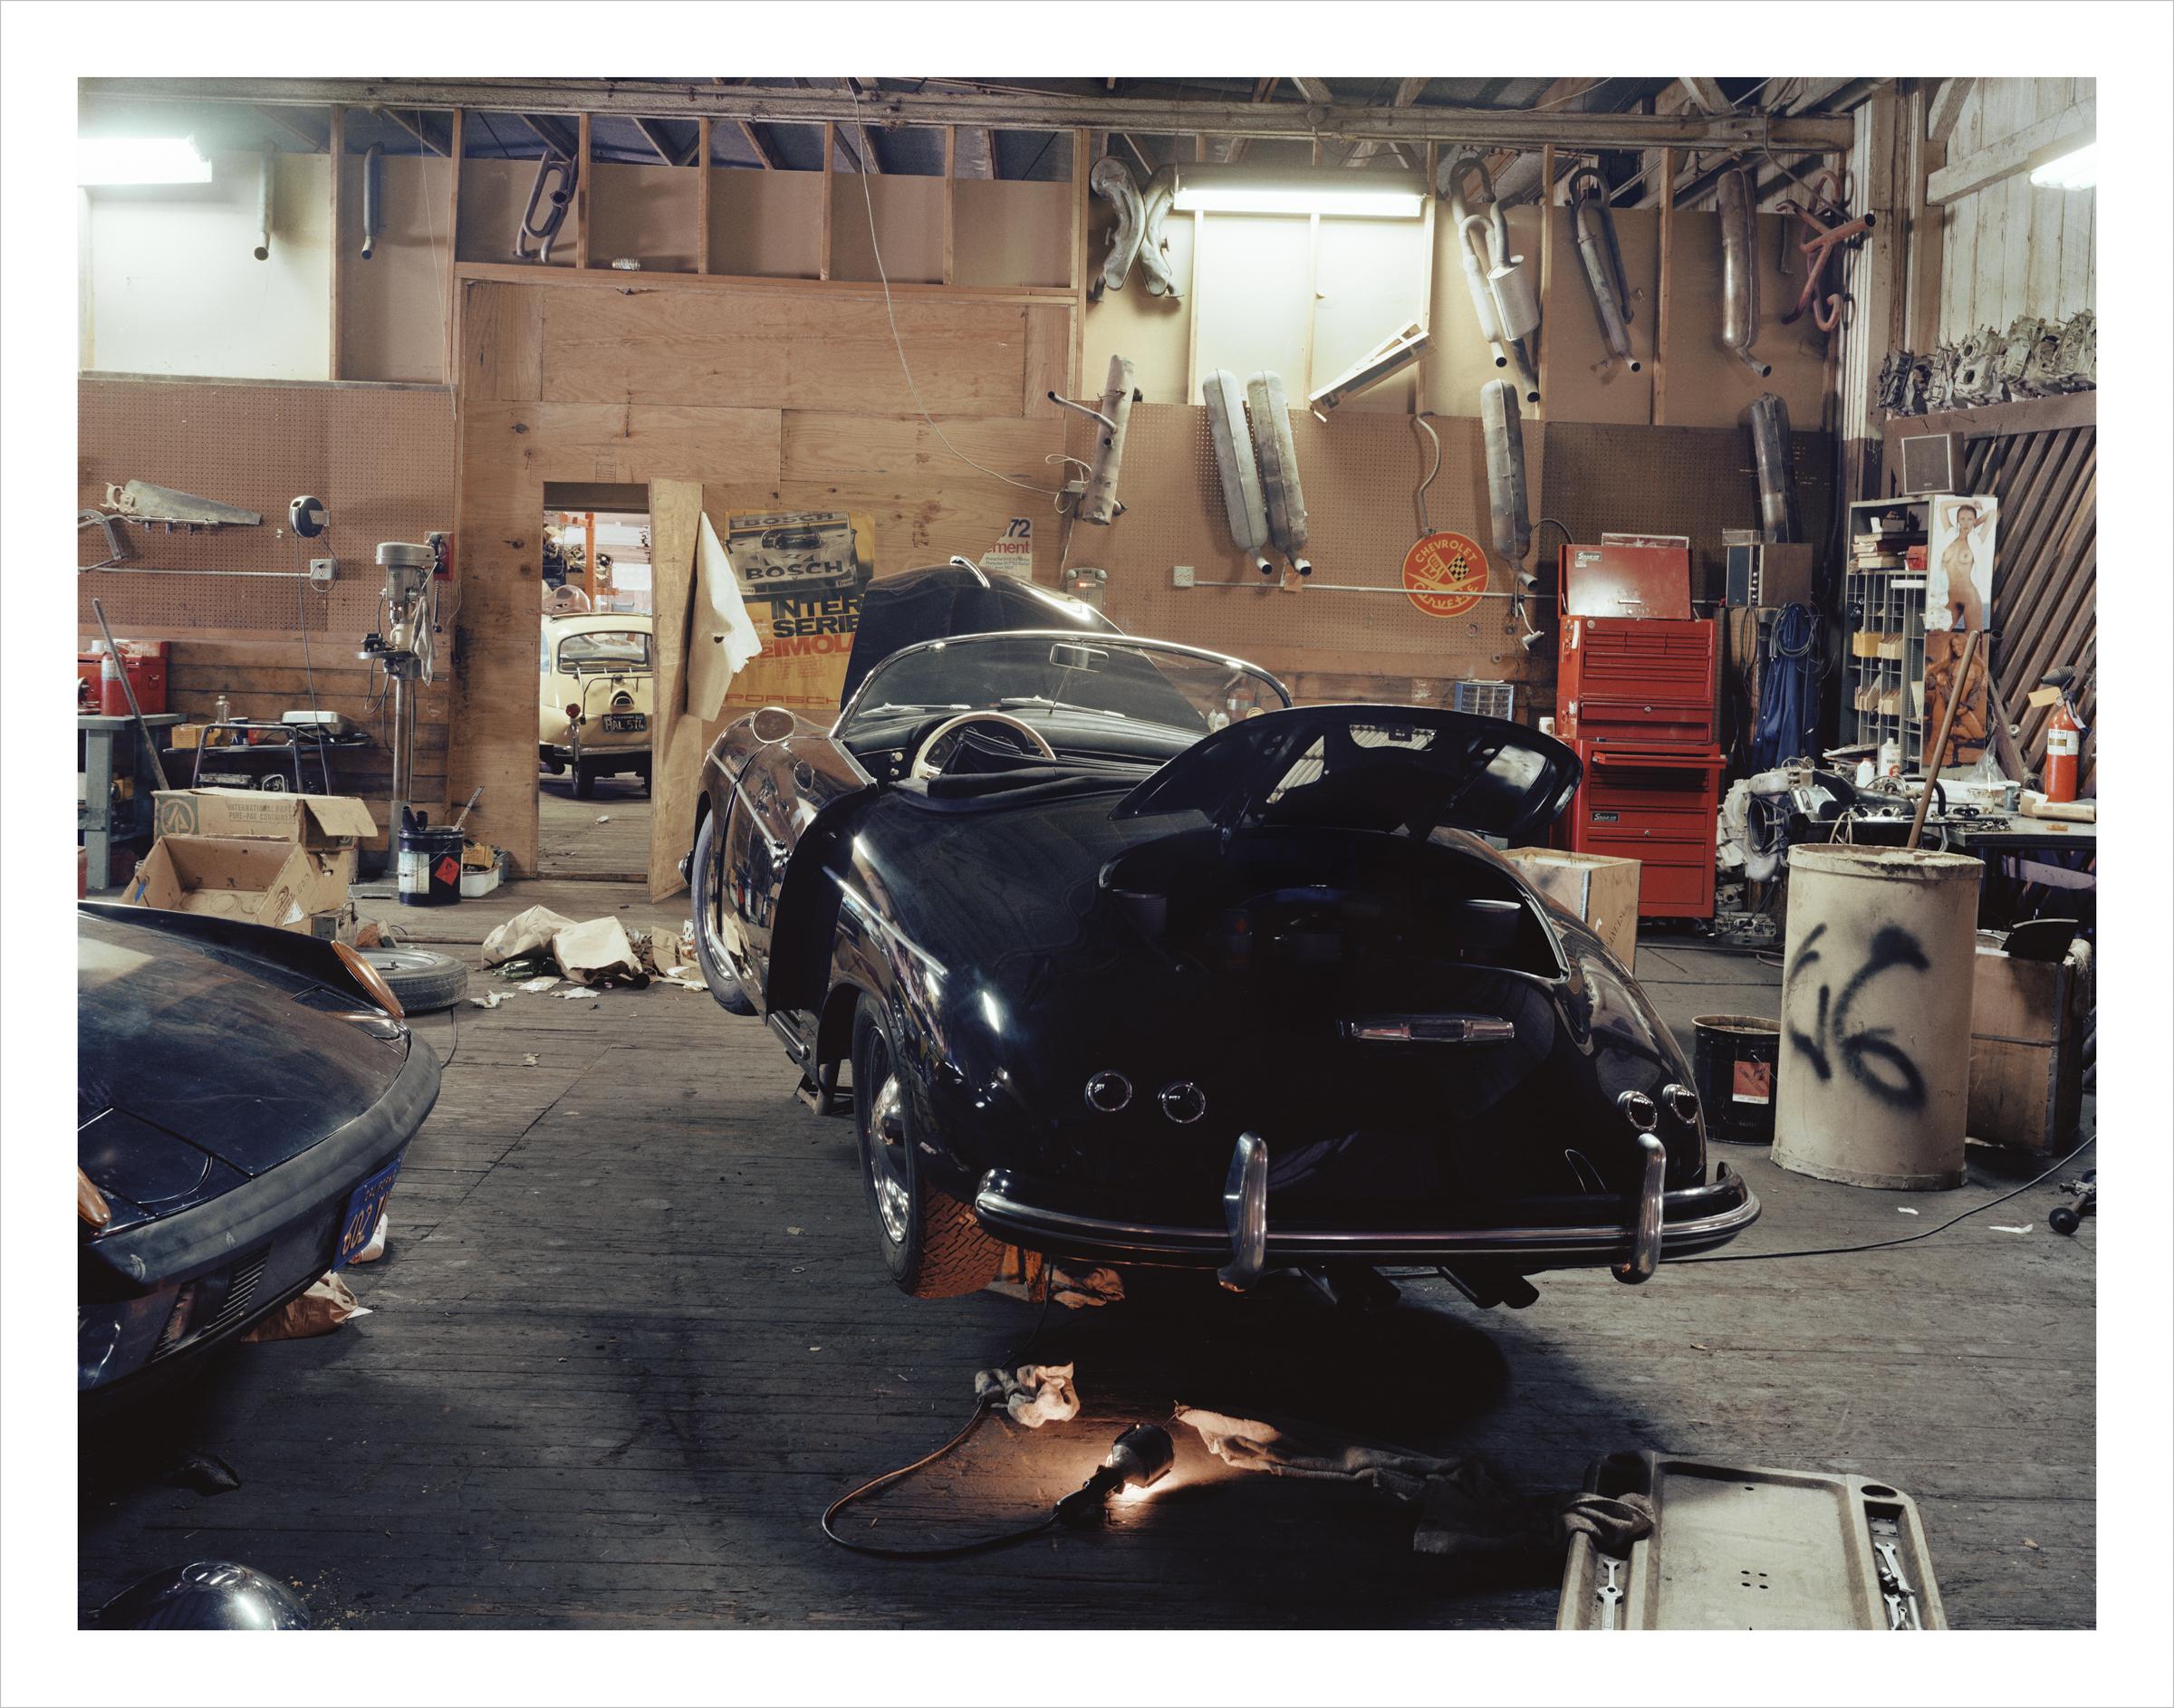 Mr. Porche Auto Restoration, 270 Berry Street, 1980 Archival Pigment Print, 2016 16 x 20 inches, edition of 5; 20 x 24 inches, edition of 2; 30 x 40 inches, edition of 2